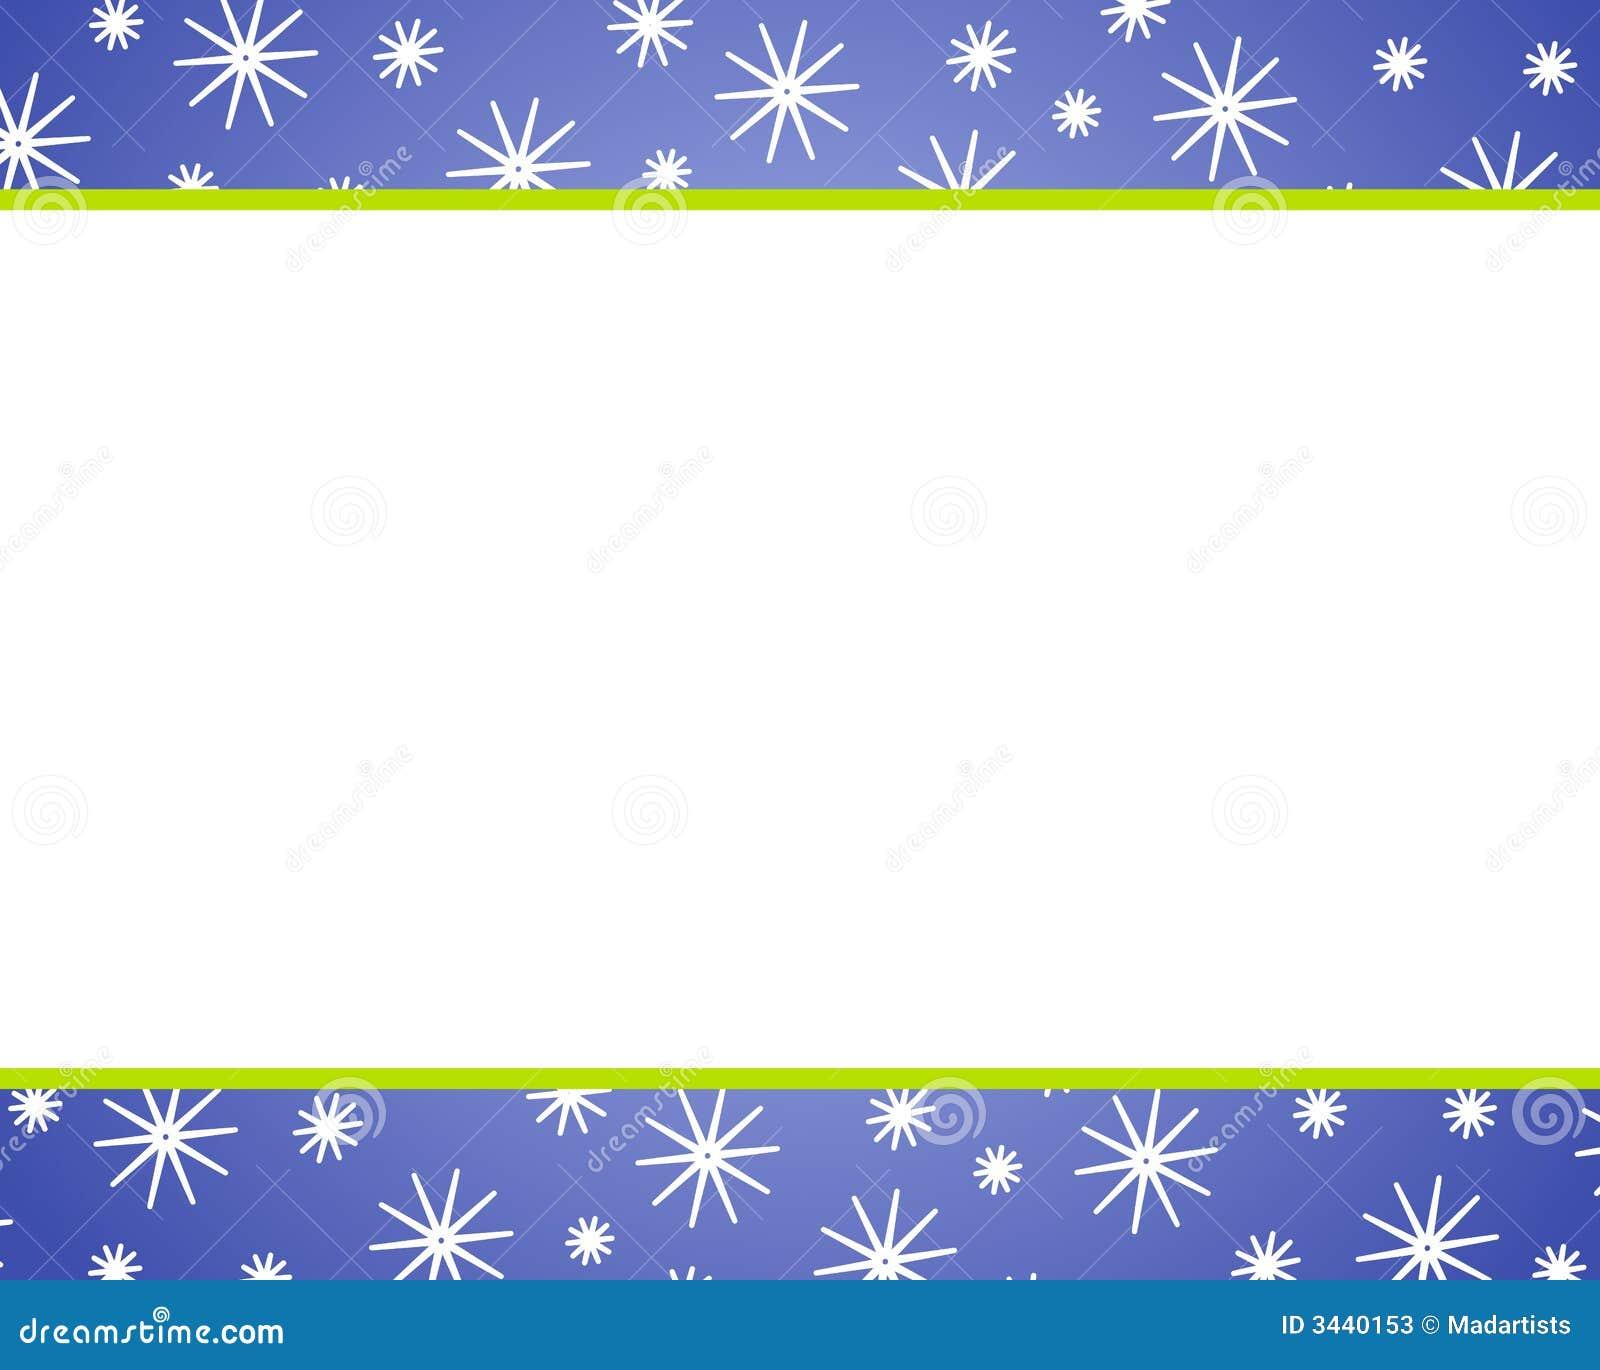 Blue Christmas Snow Borders Stock Photos - Image: 3440153